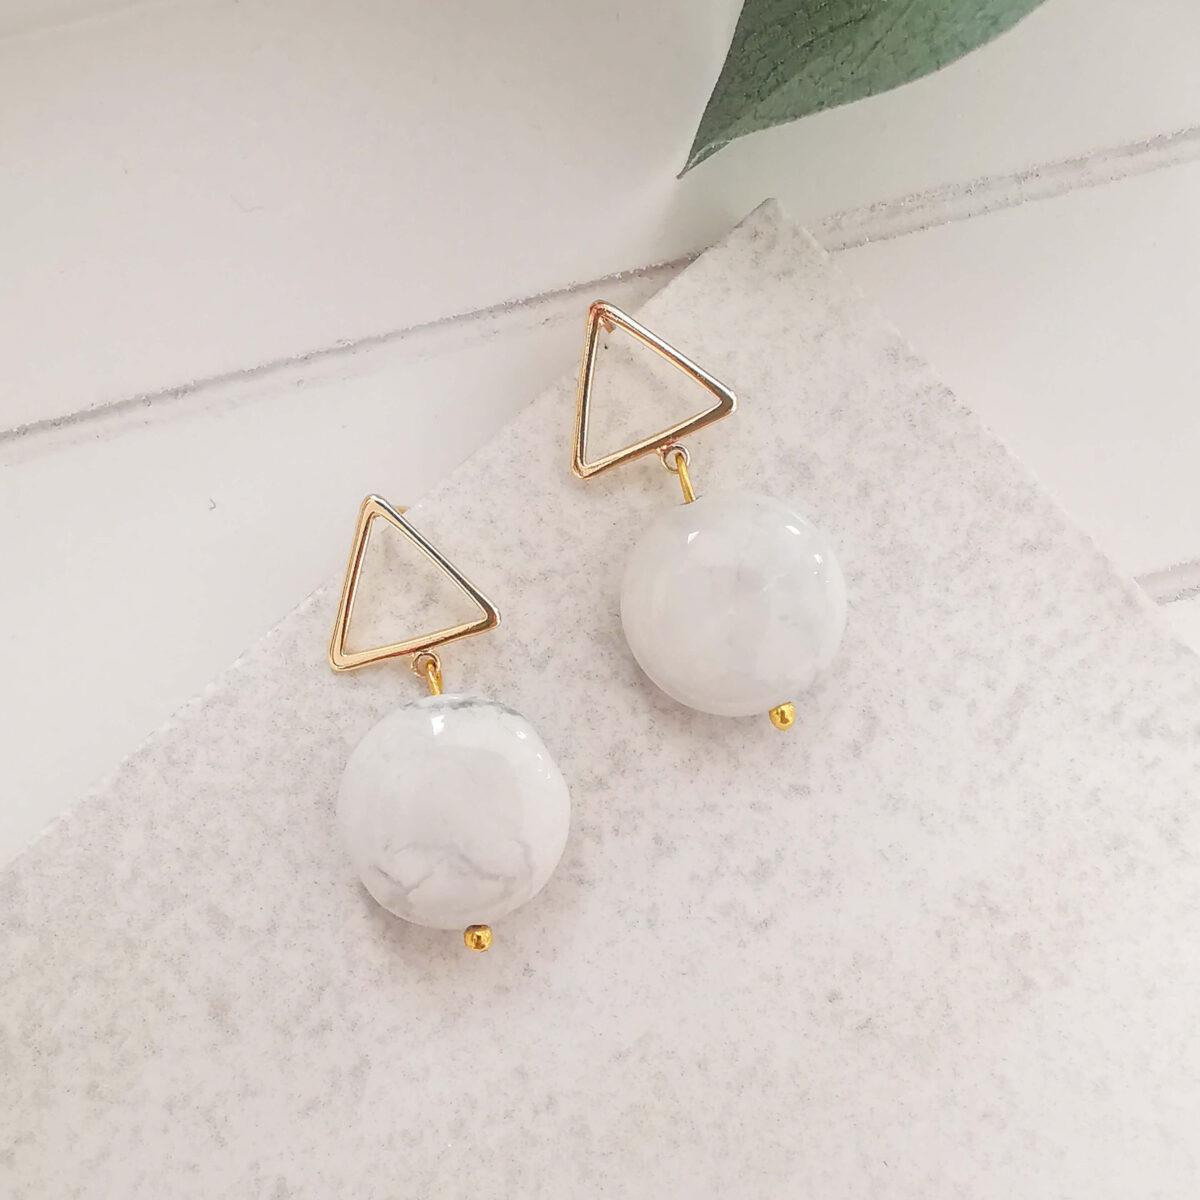 REVA - 18K Gold Plated White Marble Look Stone Earrings on a plain tile background